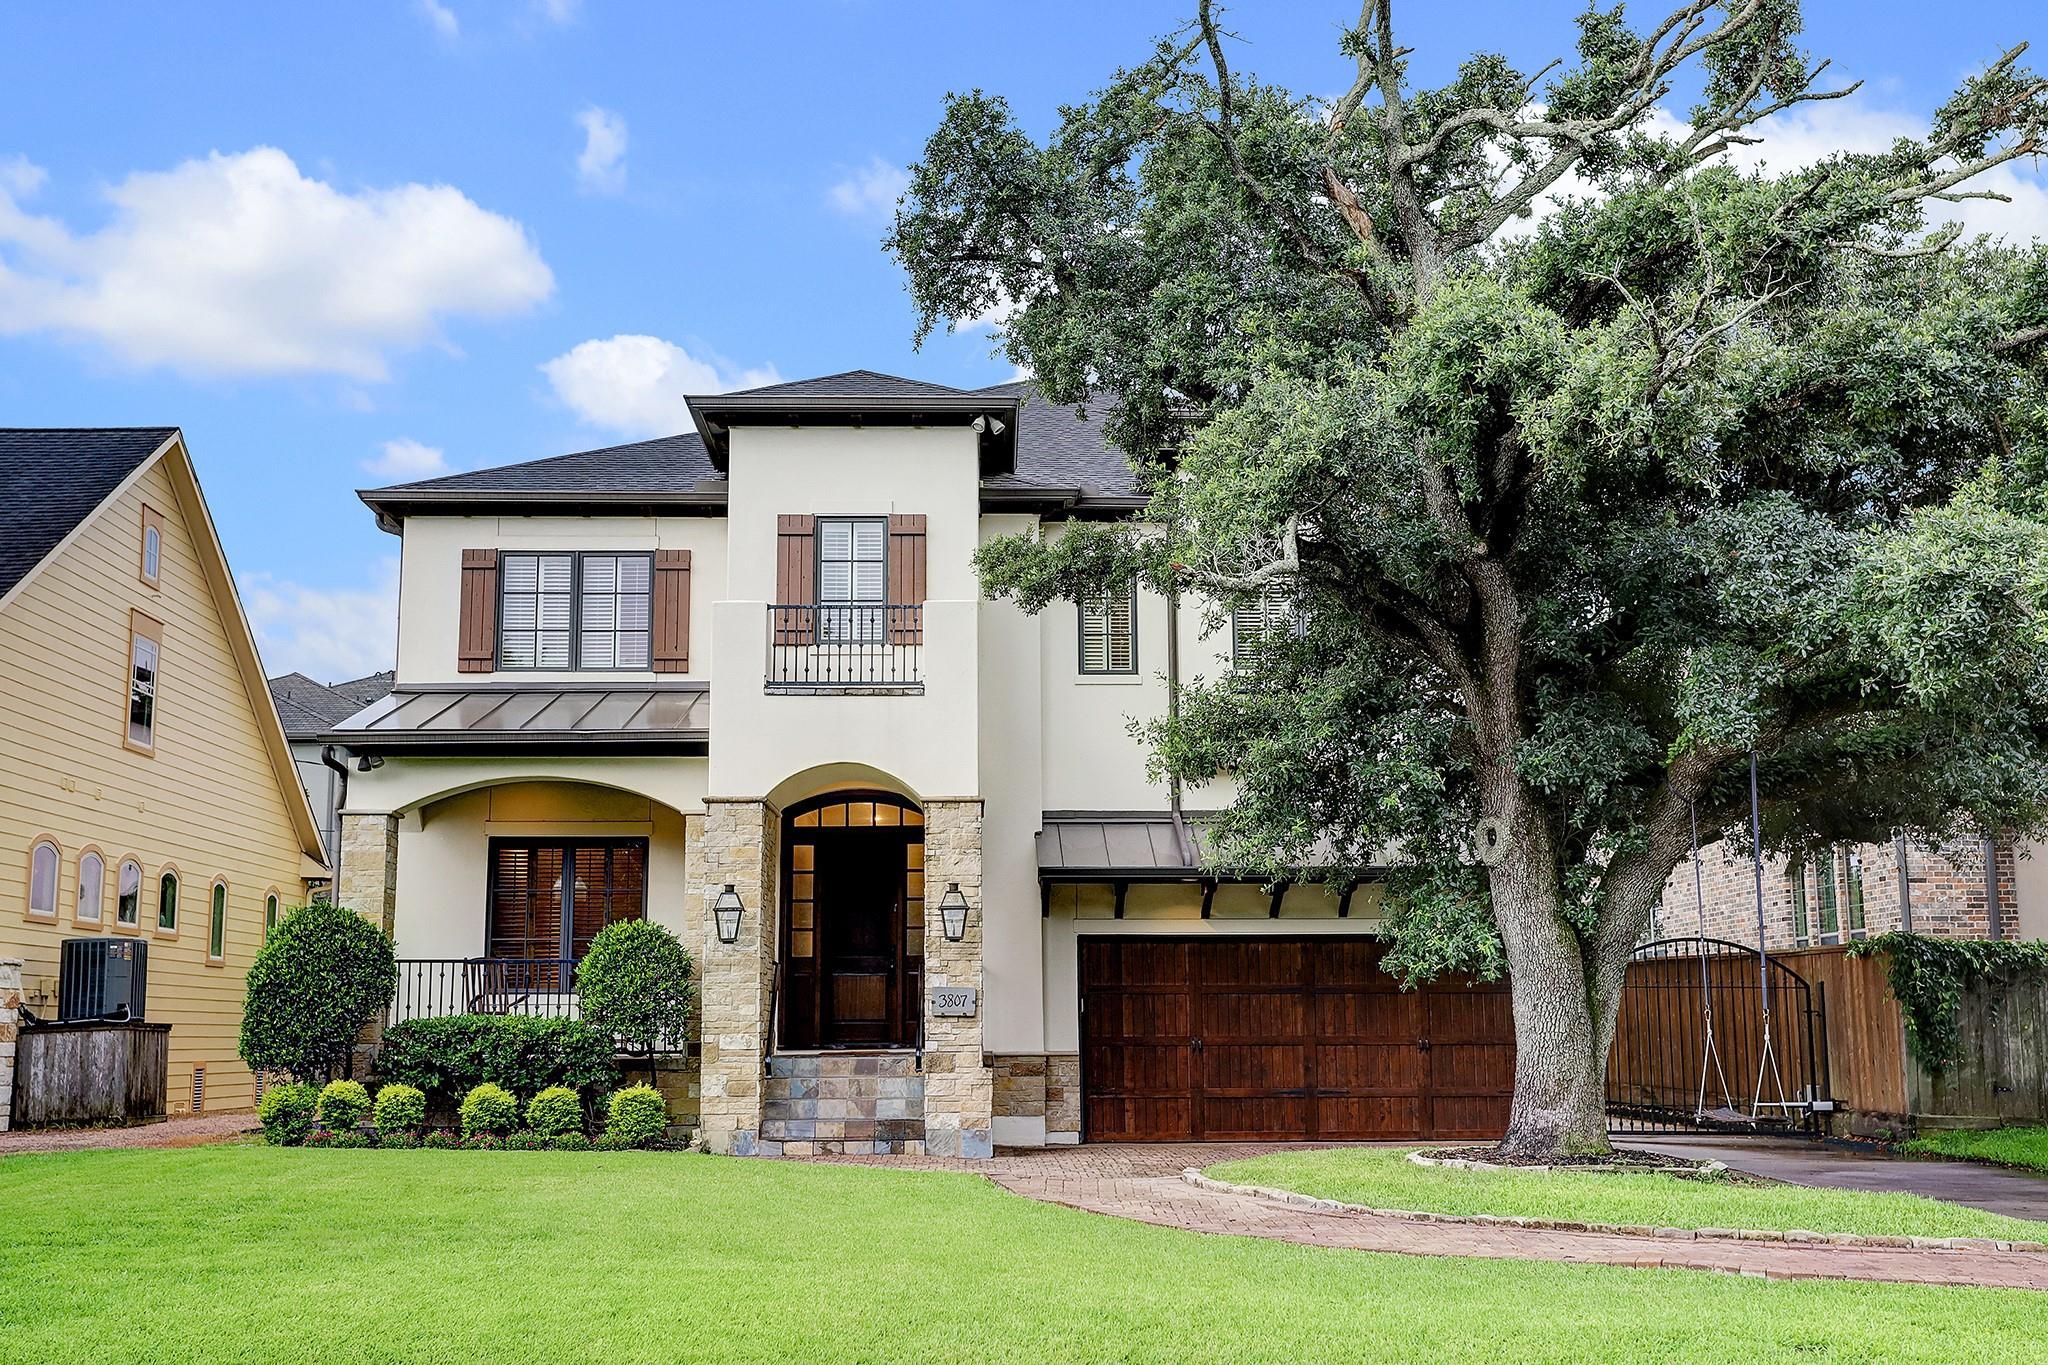 3807 Merrick Property Photo 1